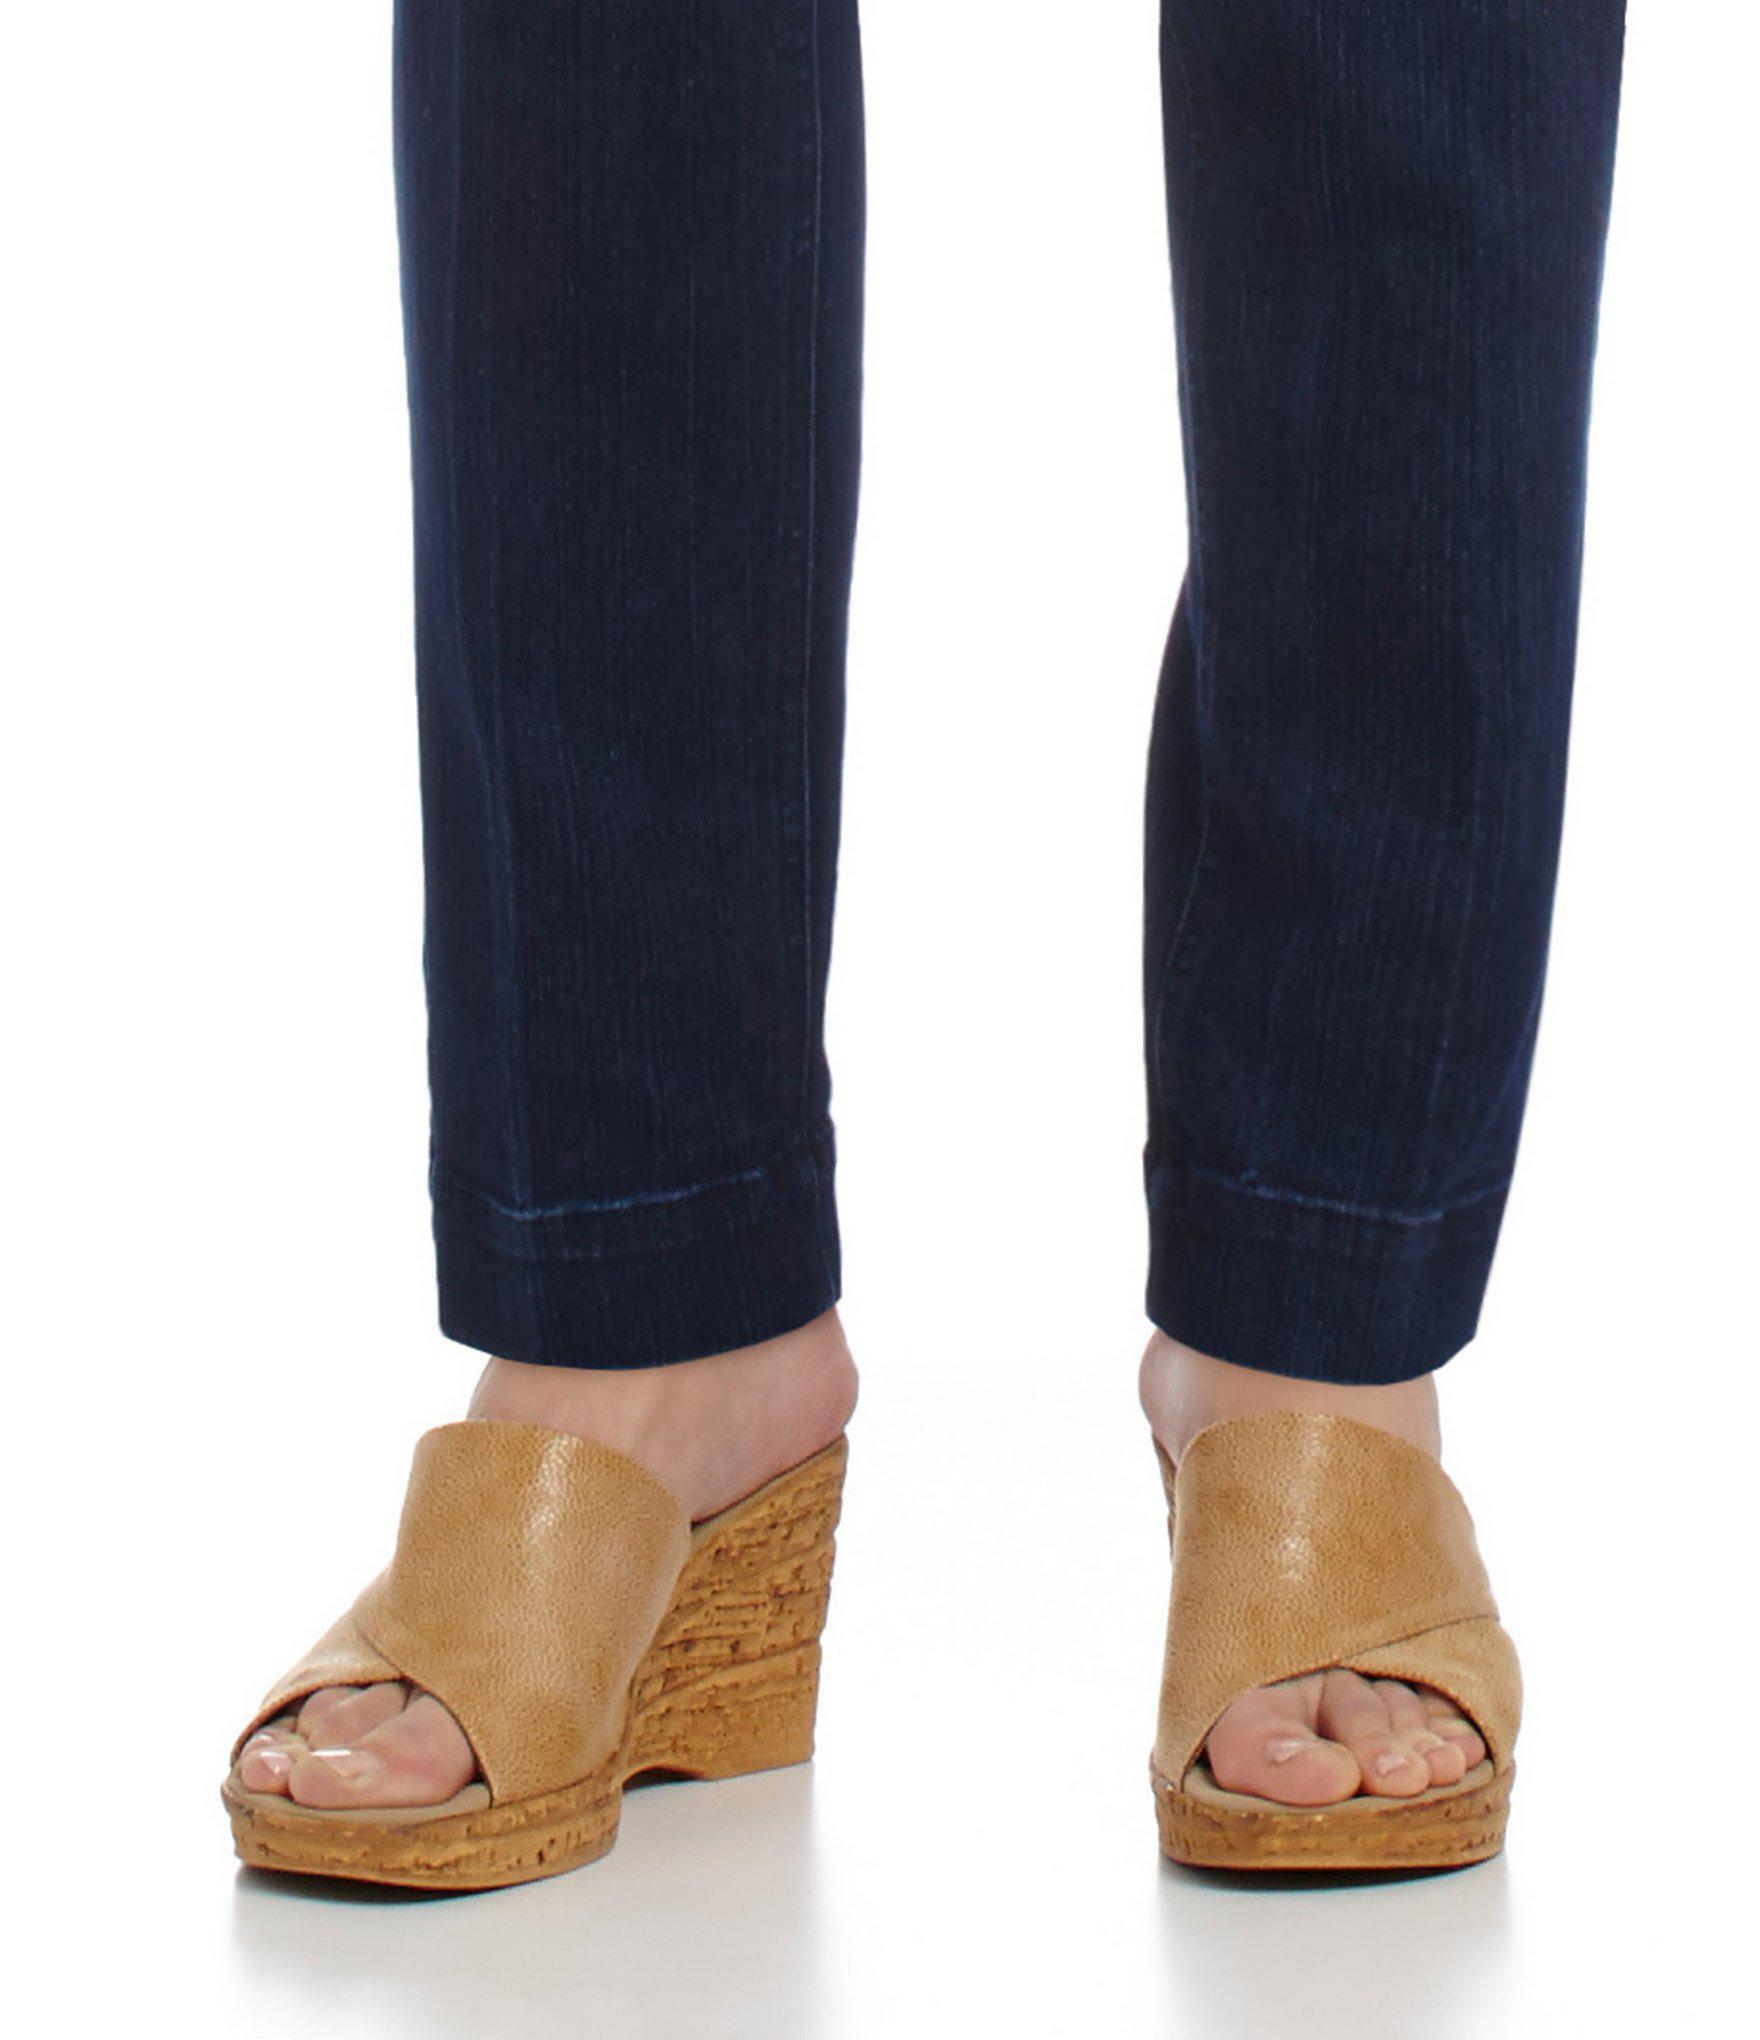 c56e5cd3b08 Onex - Natural Christina Leather Banded Cork Wedge Sandals - Lyst. View  fullscreen